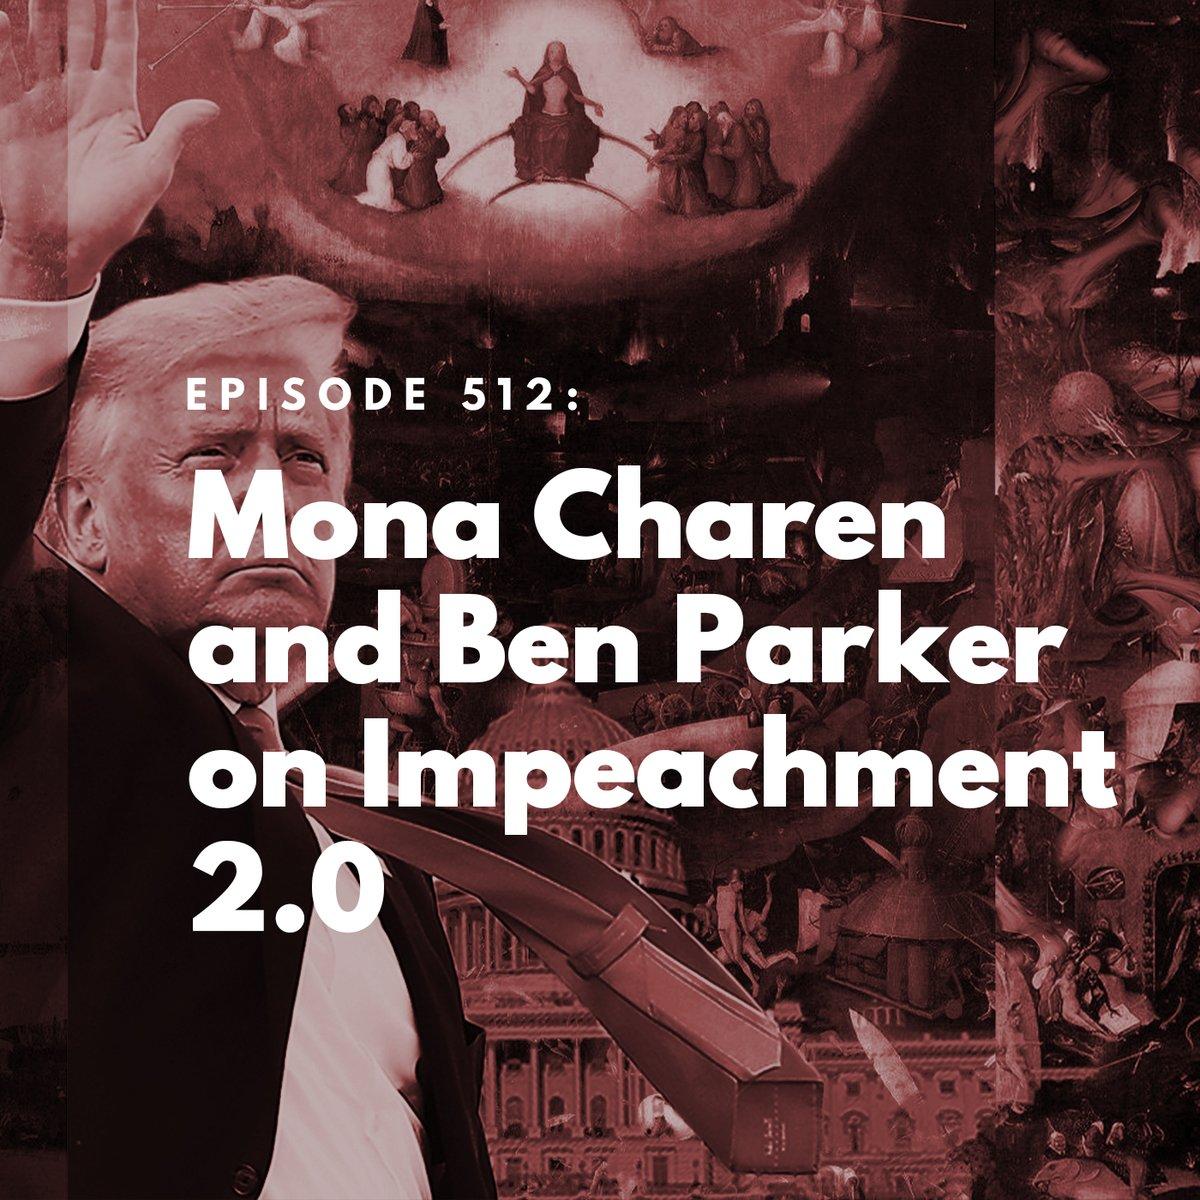 On today's @BulwarkOnline podcast, @monacharen and @pennbarker join @SykesCharlie to discuss President Trump's second impeachment.